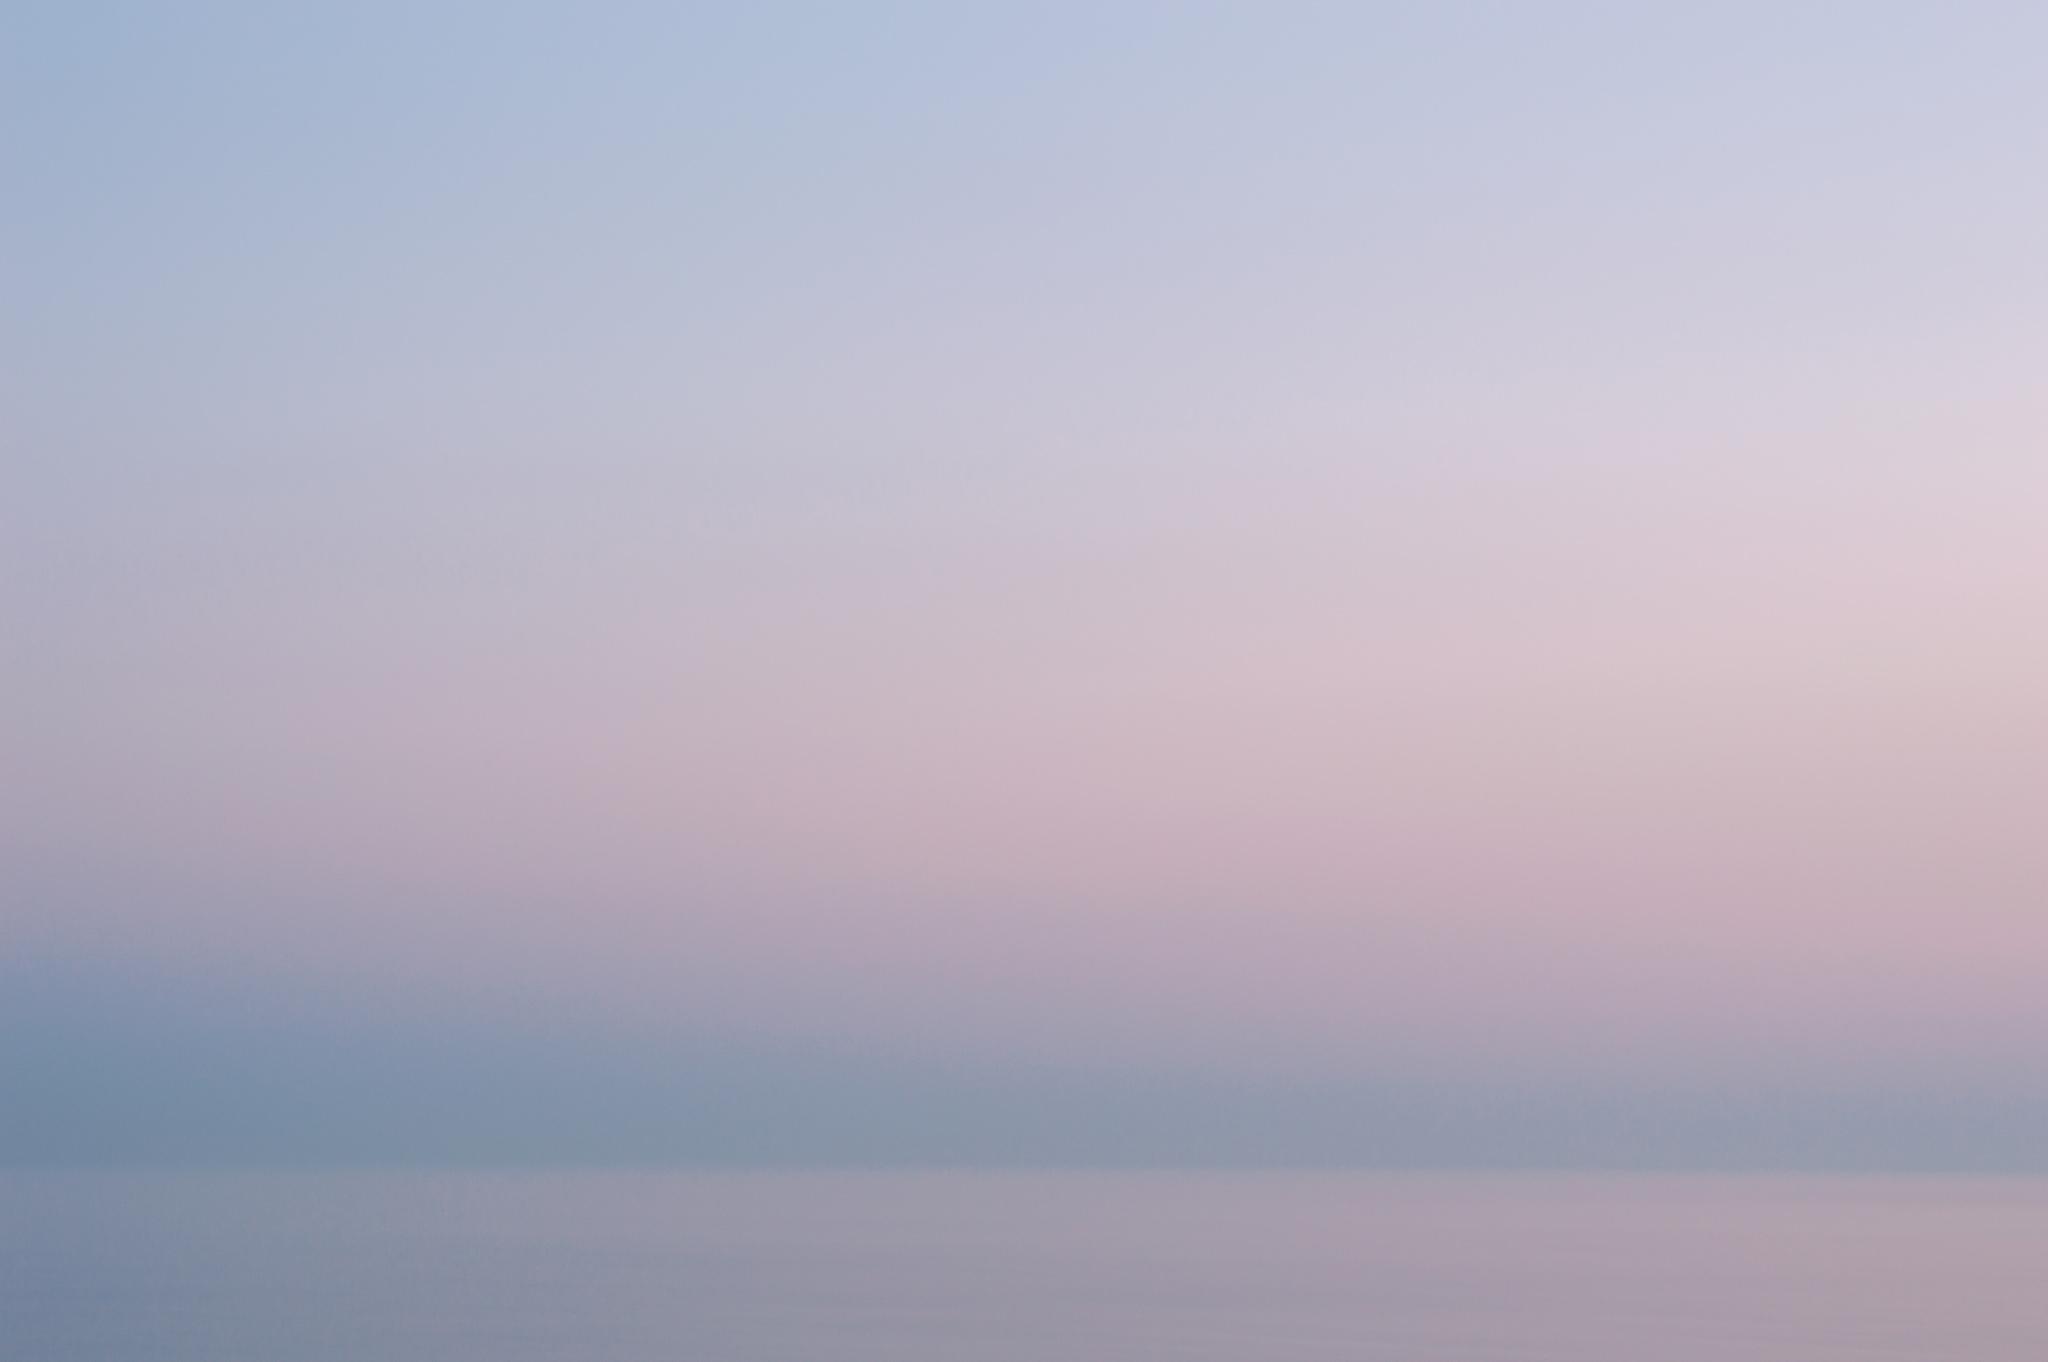 sunrise abstract.jpg